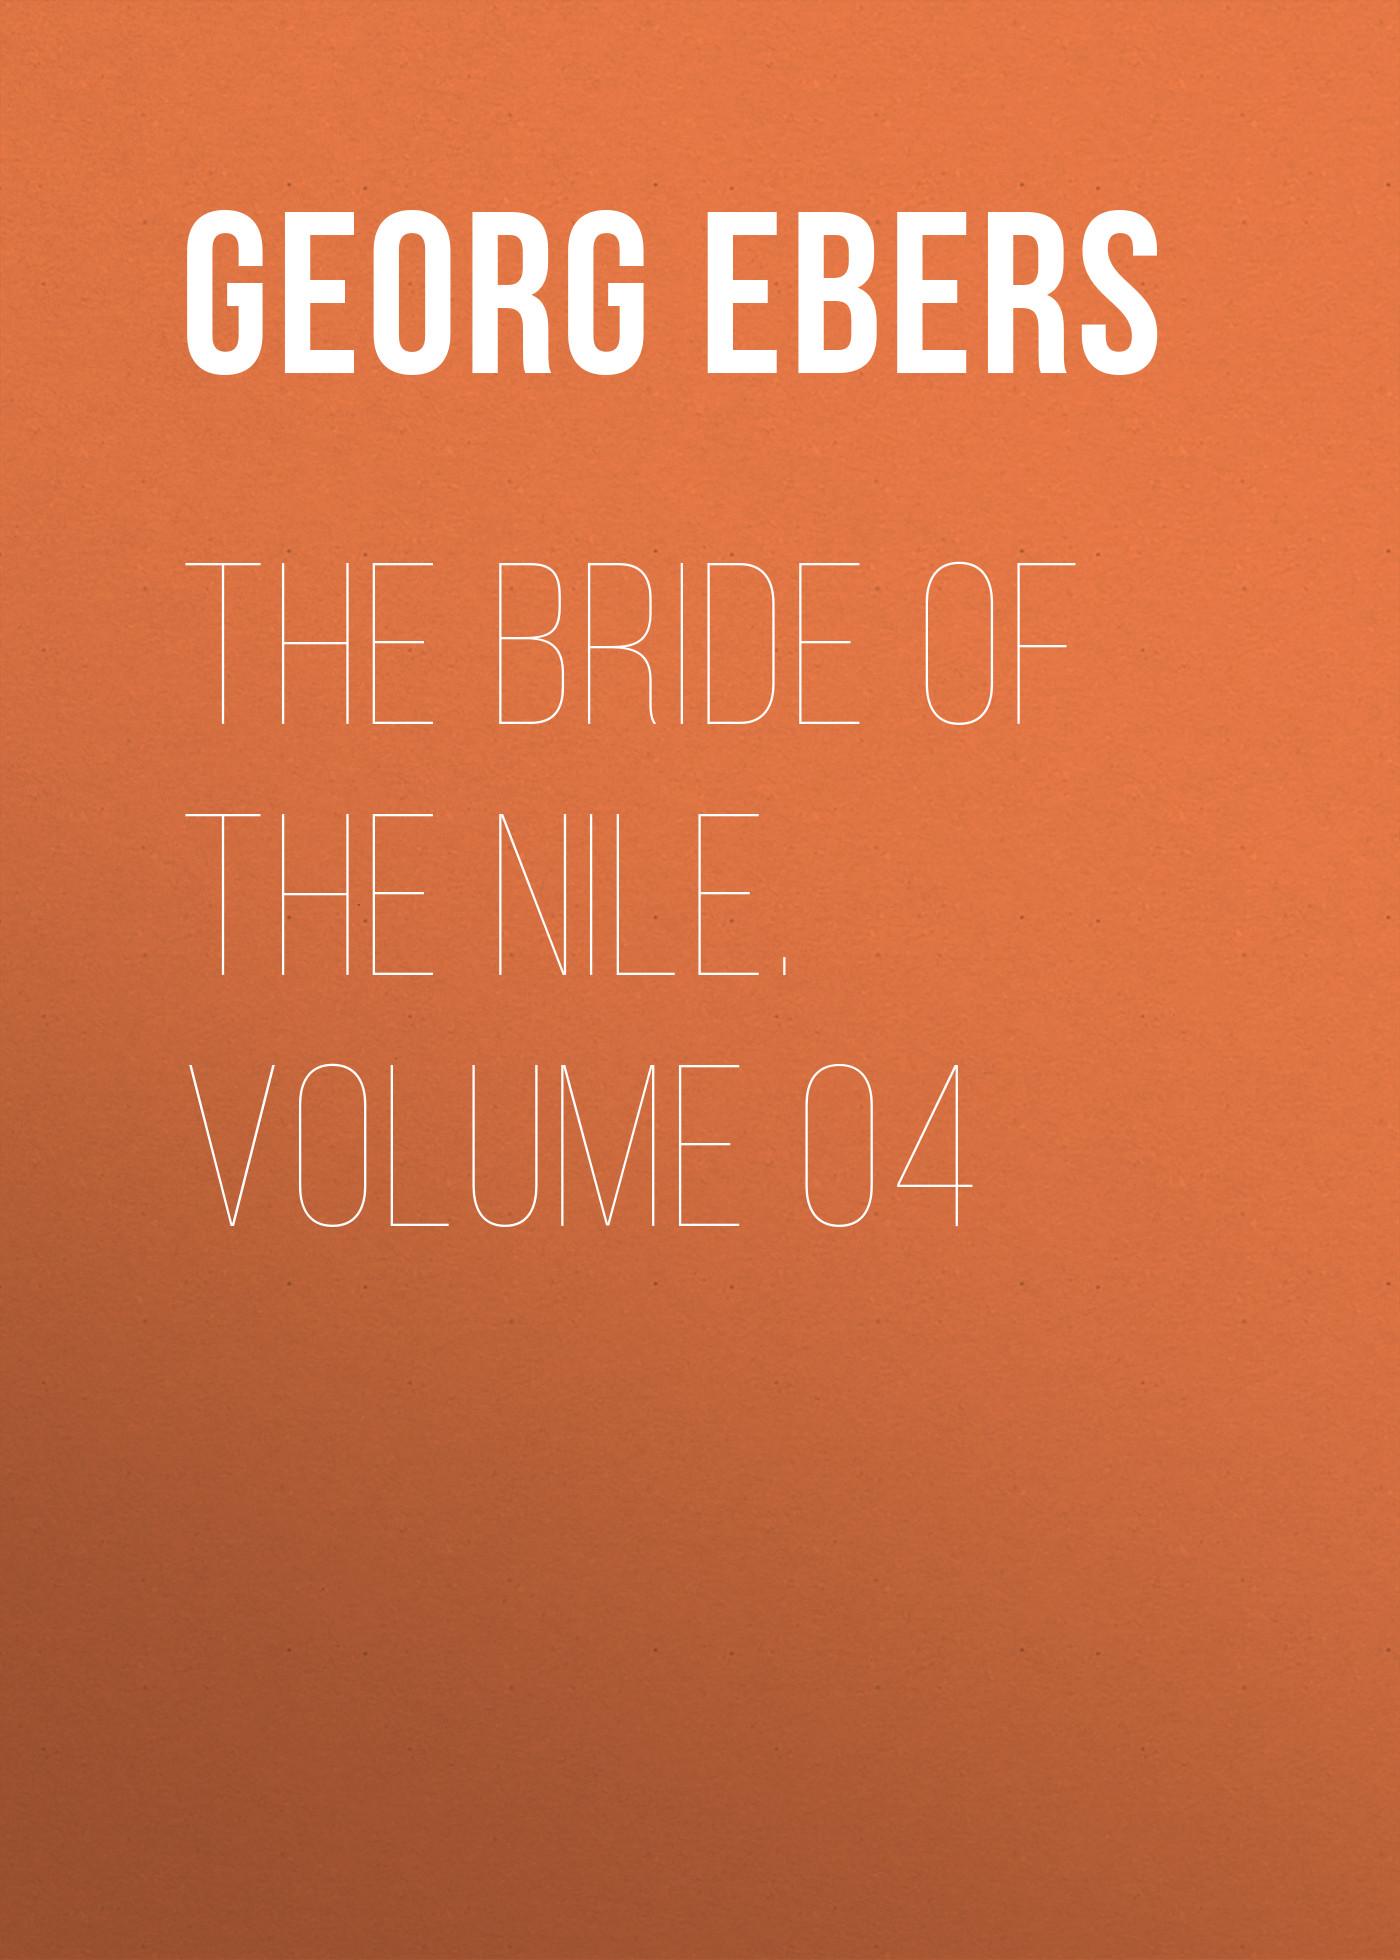 Georg Ebers The Bride of the Nile. Volume 04 gervinus georg gottfried the art of drinking